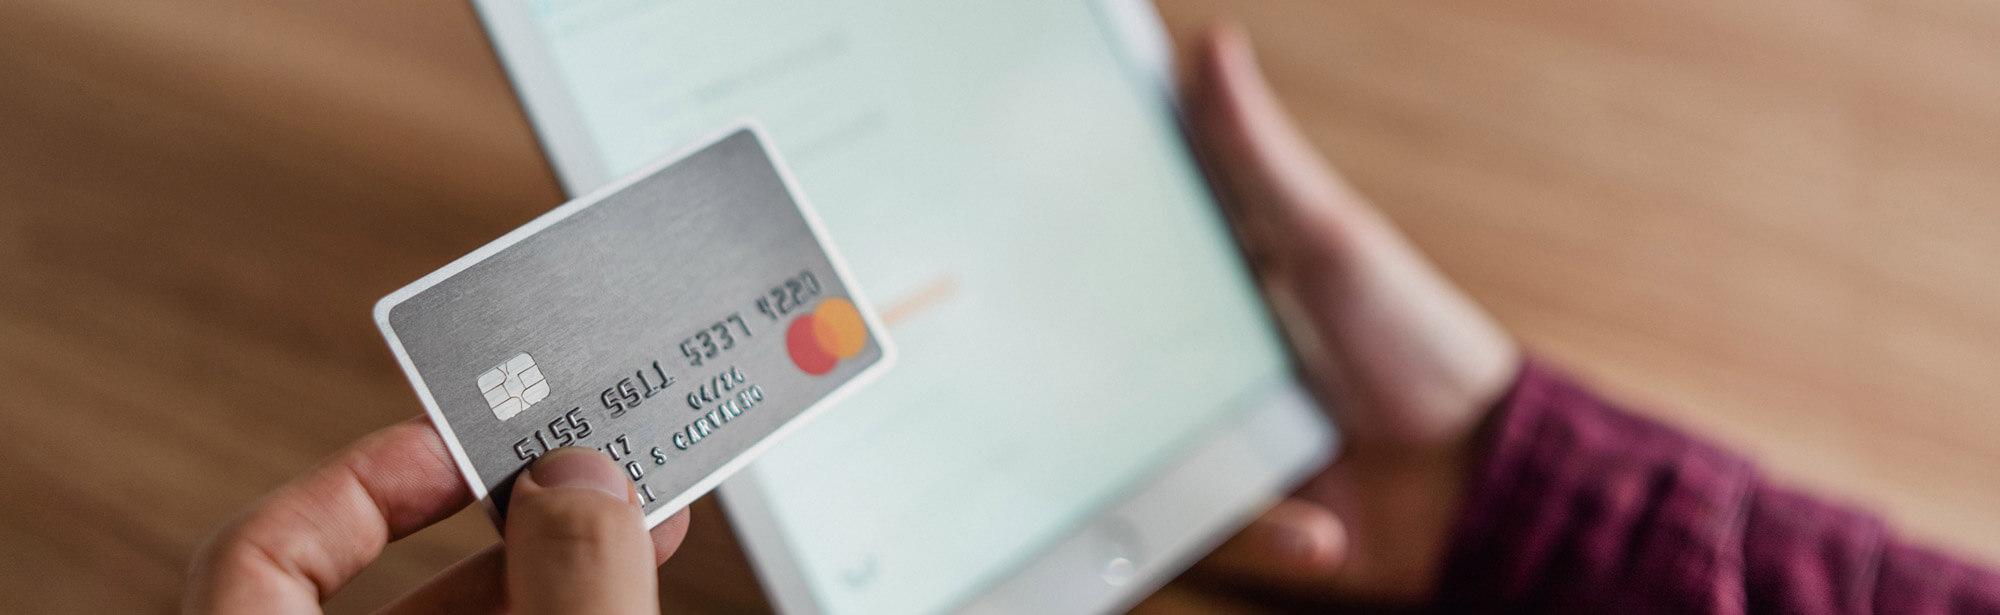 Credit cards in Latin America